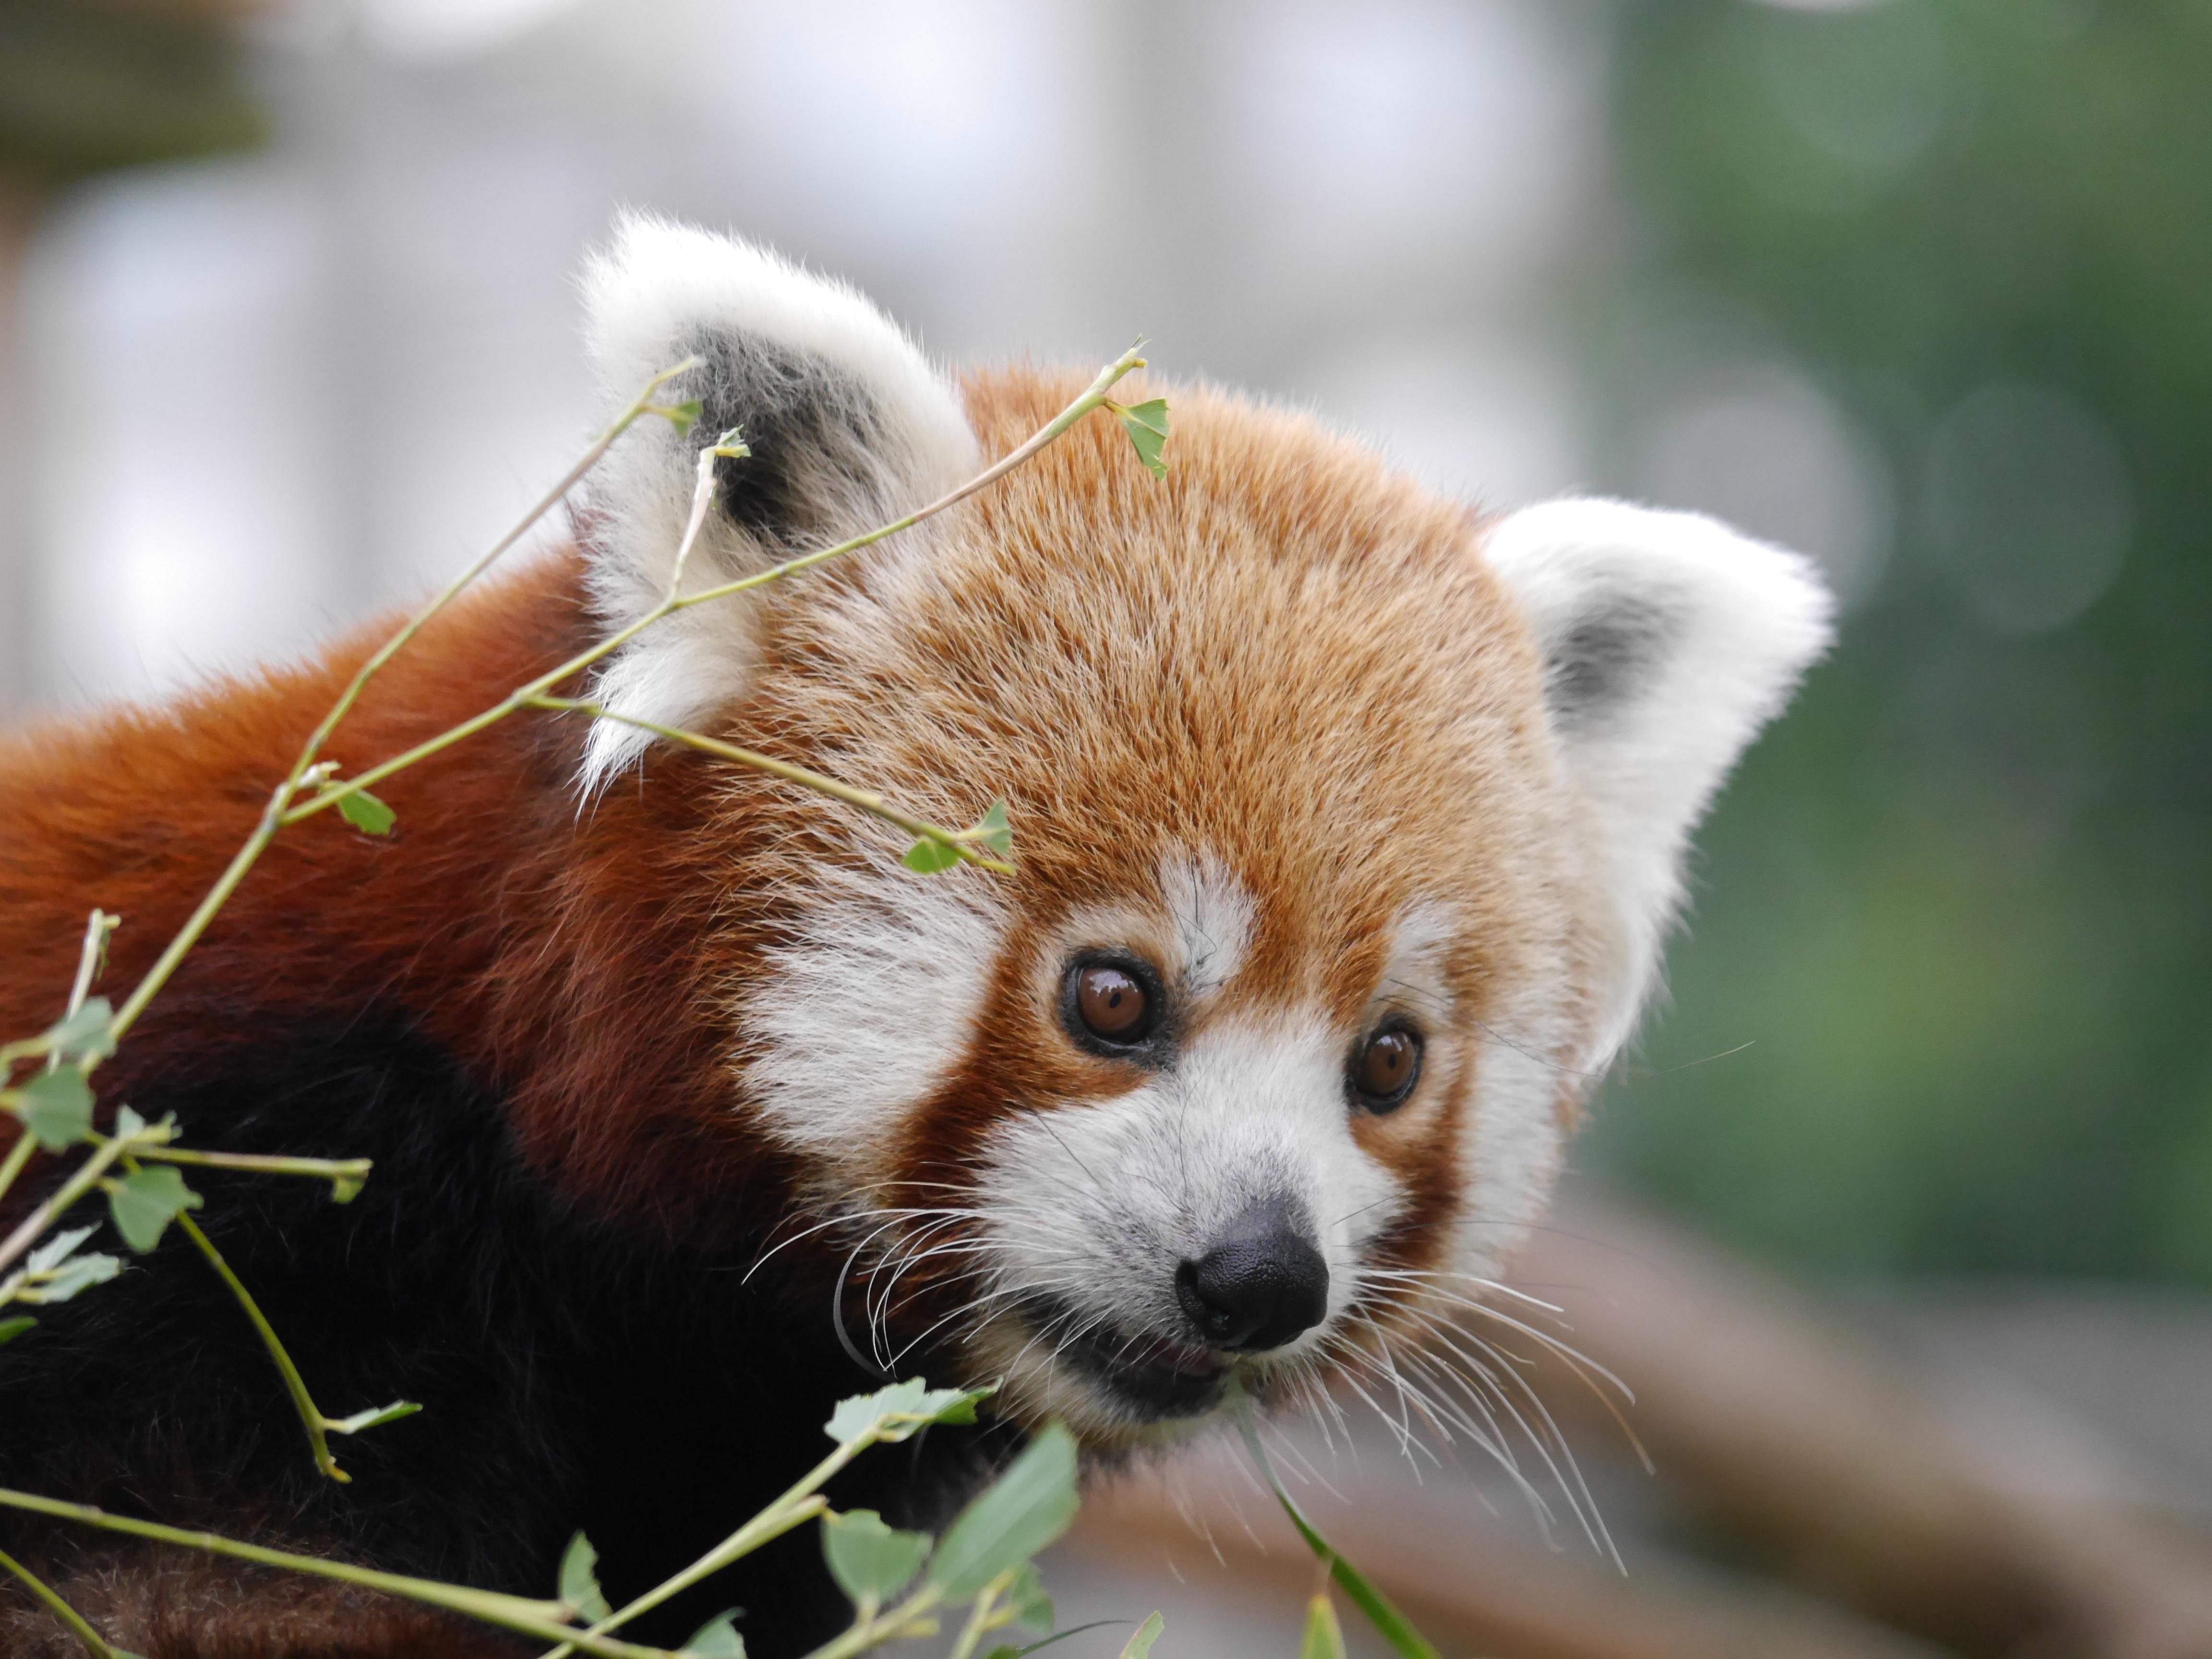 Panda Roux 4k Ultra Fond d'écran HD   Arrière-Plan   4608x3456   ID:650164 - Wallpaper Abyss